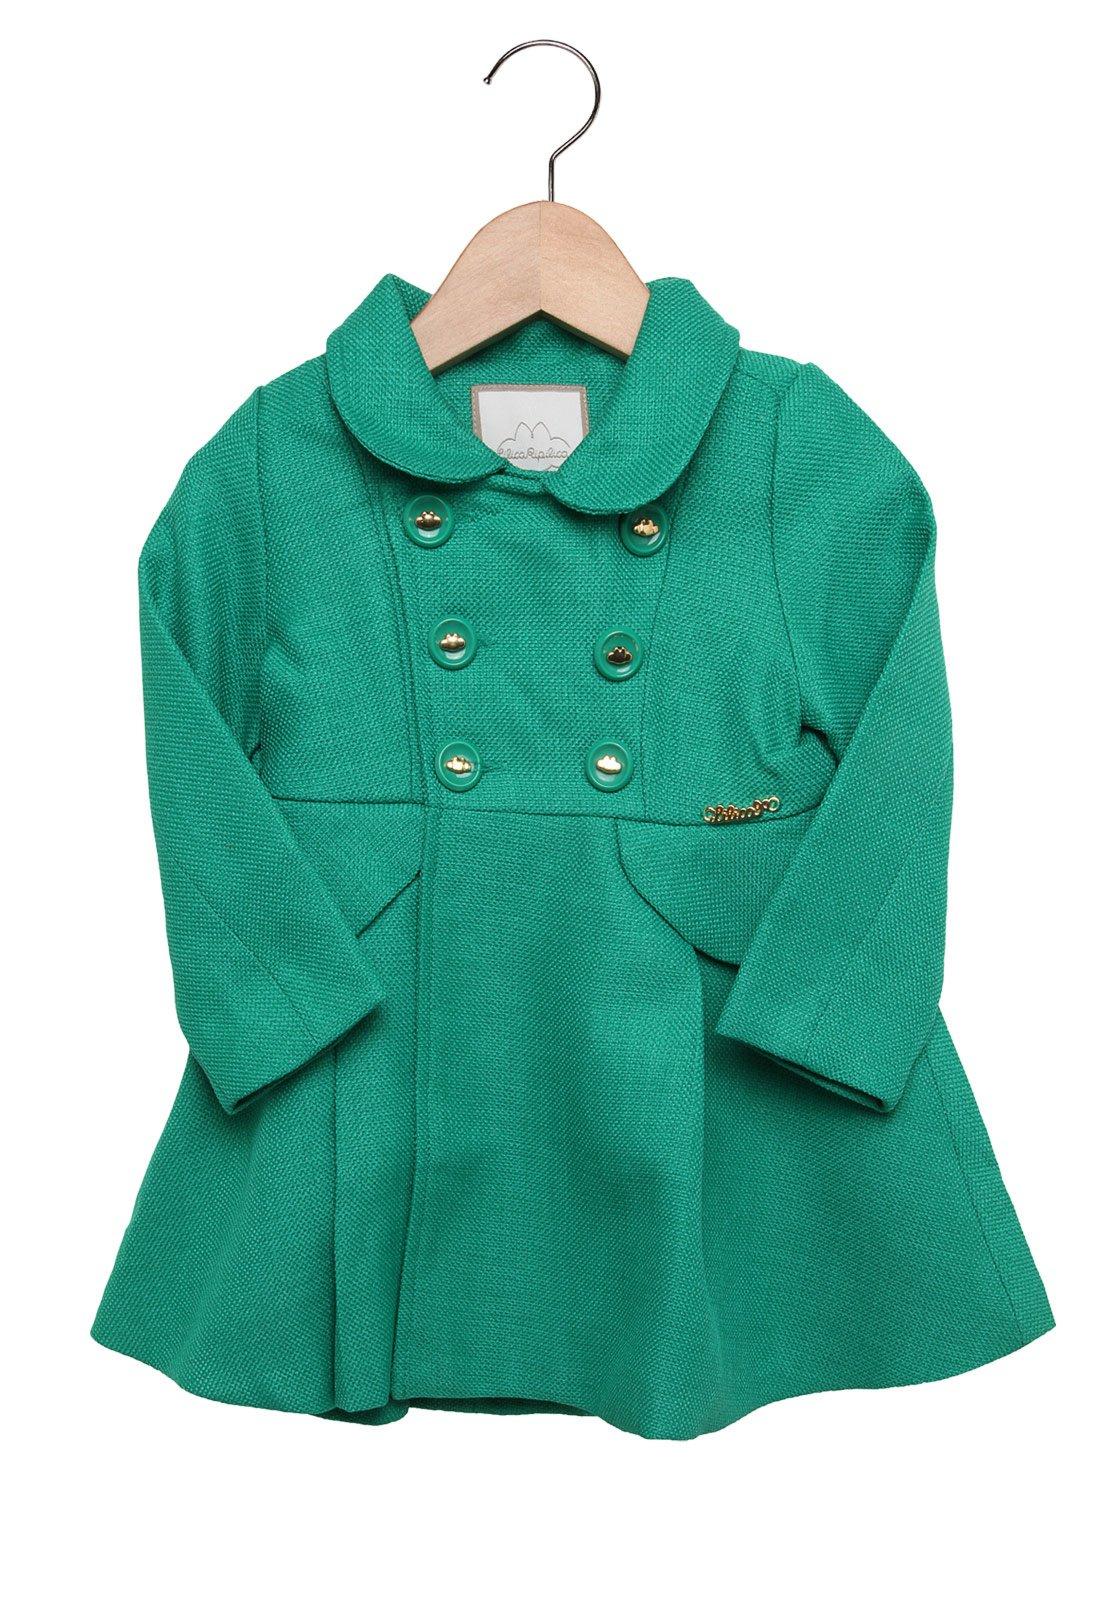 9218c34e4c Casaco Lilica Ripilica Menina Verde - Compre Agora